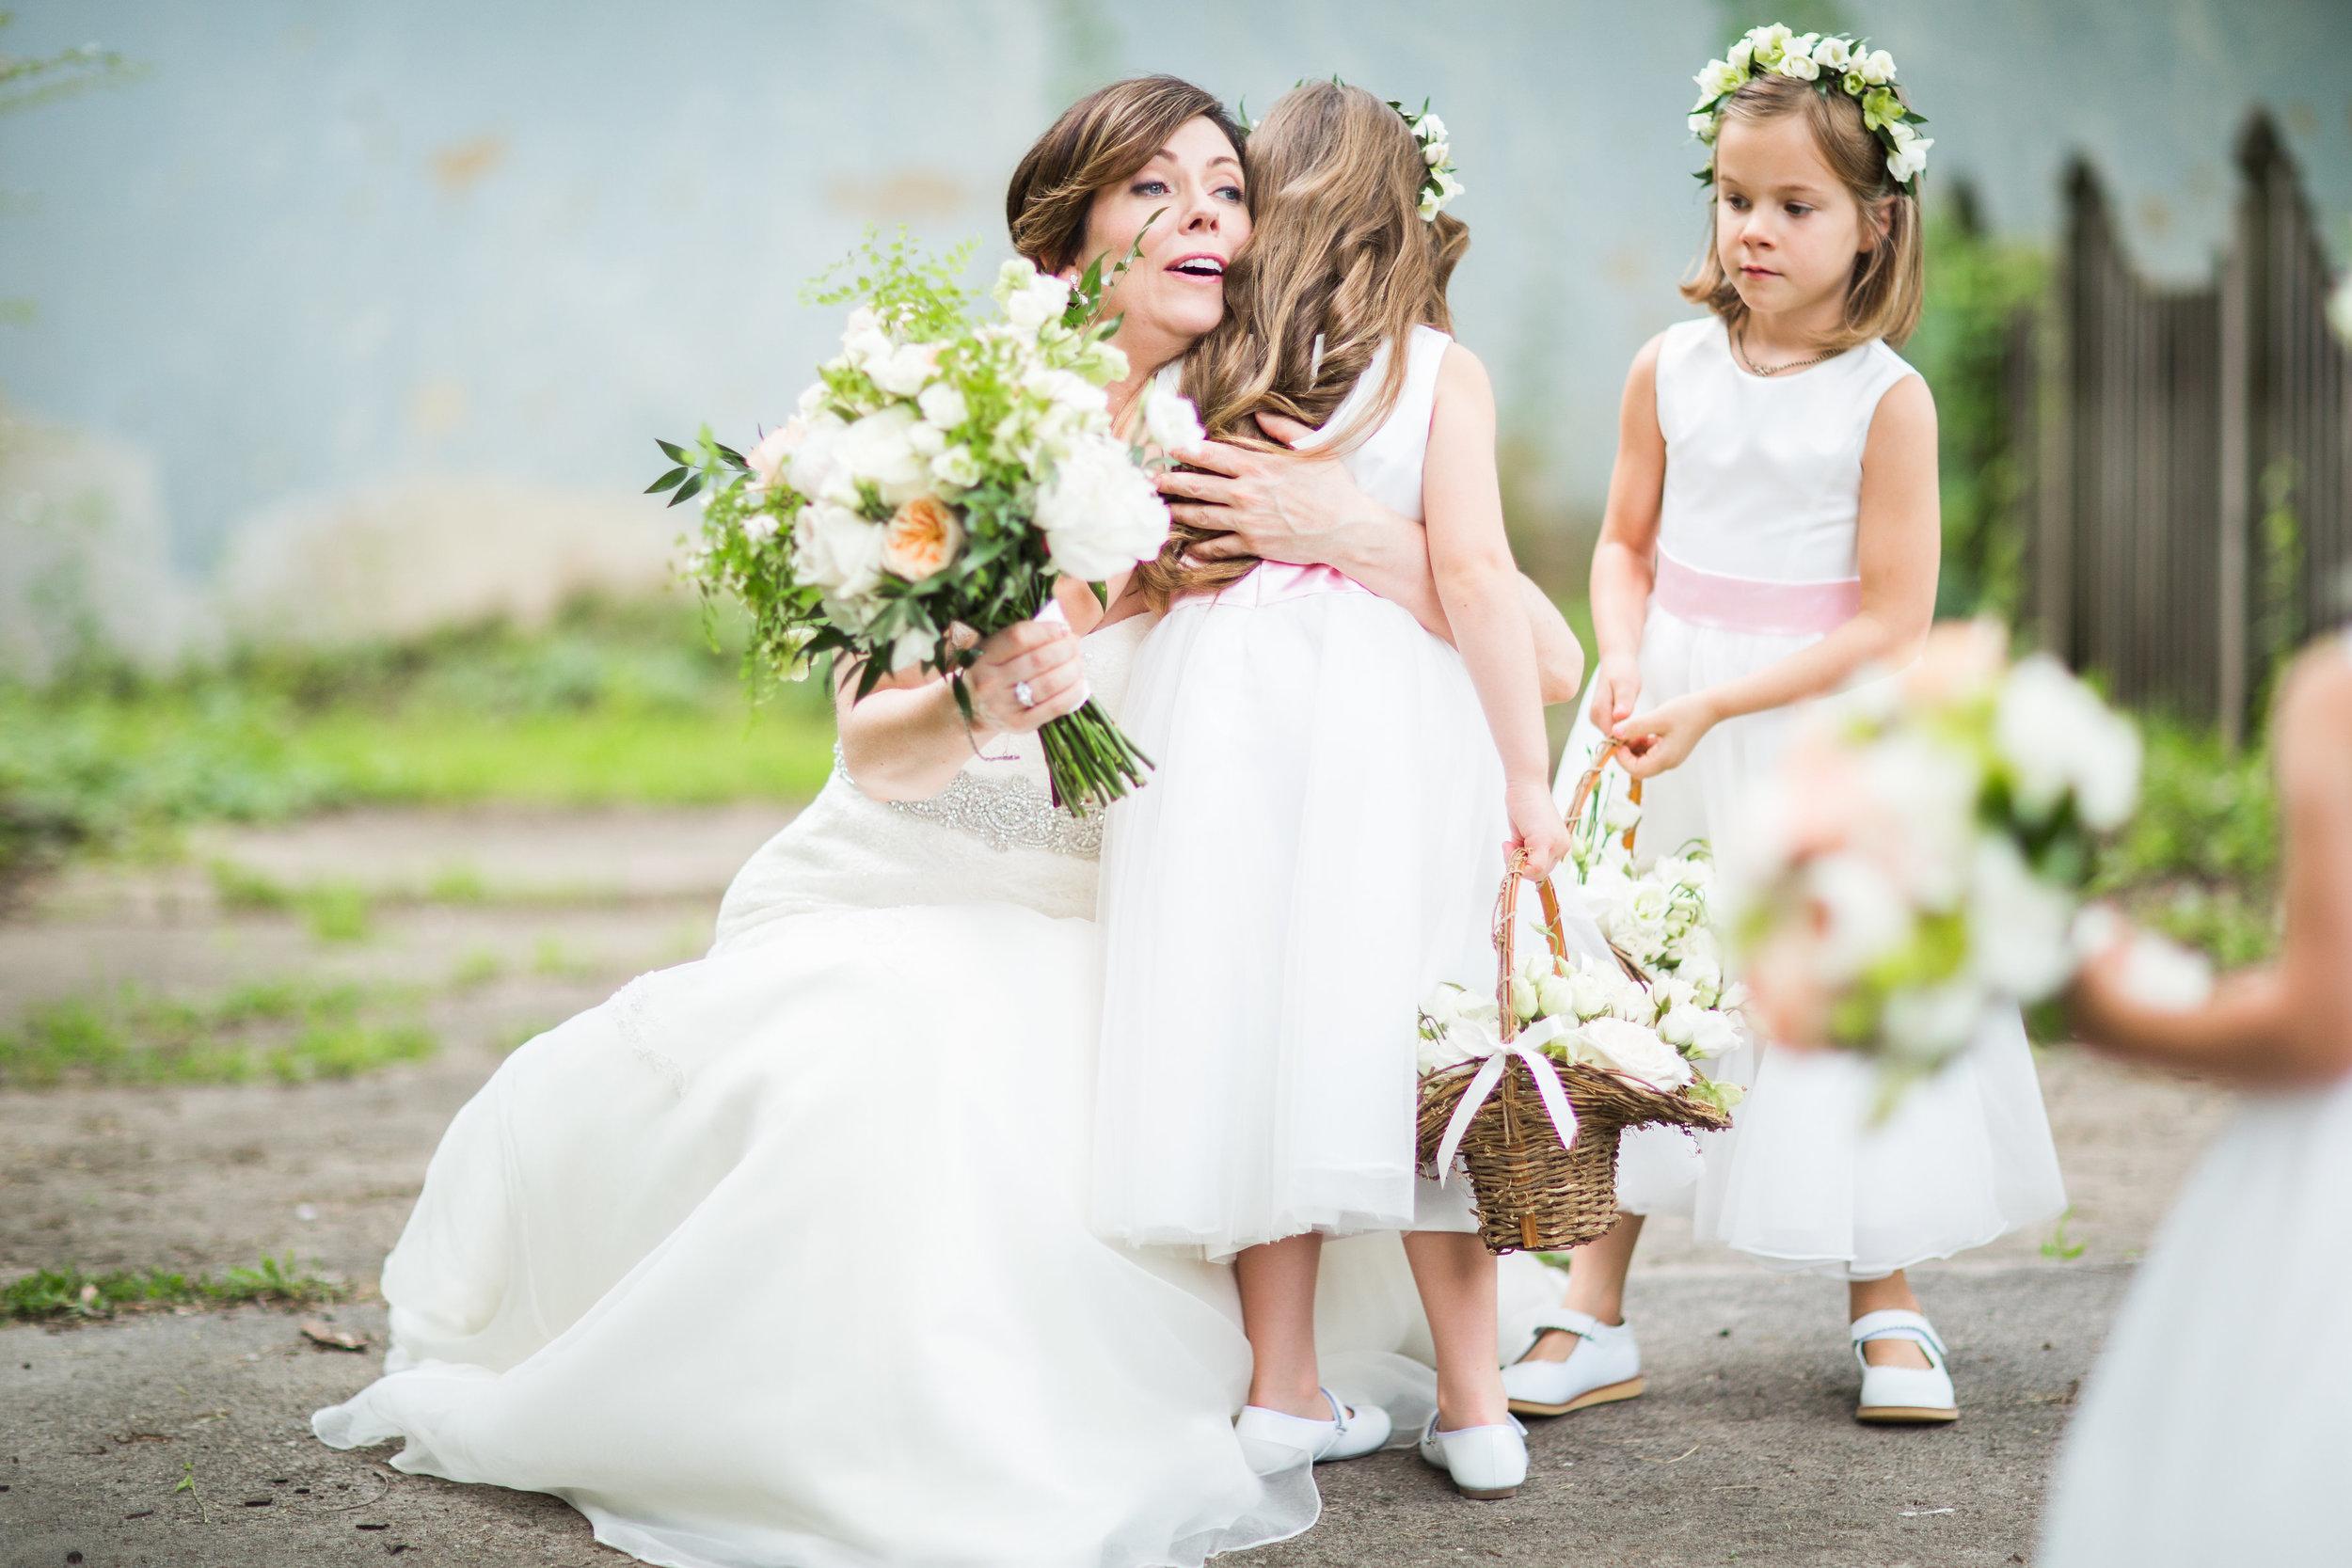 4c213-chapelhillnctraditionalsouthernweddingflowergirlschapelhillnctraditionalsouthernweddingflowergirls.jpg